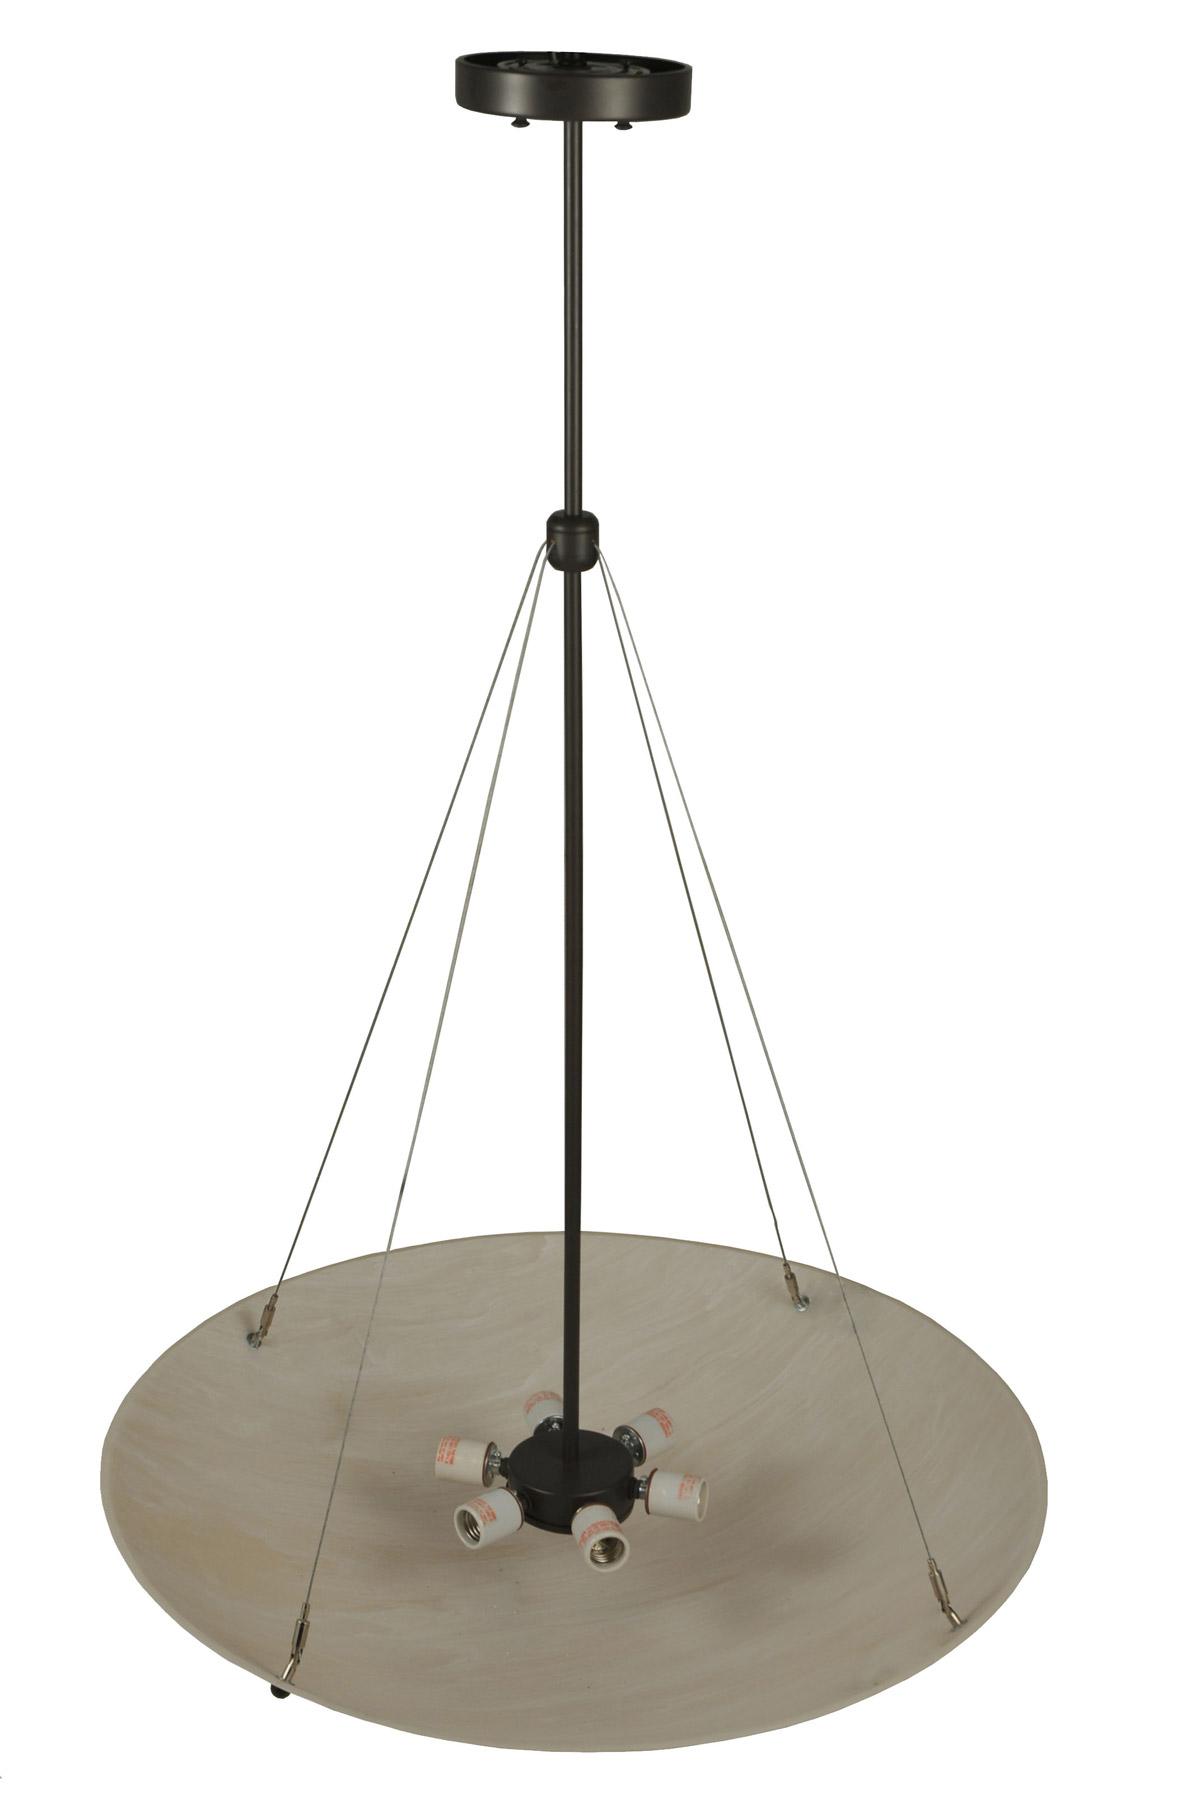 contemporary cypola inverted bowl pendant meyda 117691. Black Bedroom Furniture Sets. Home Design Ideas